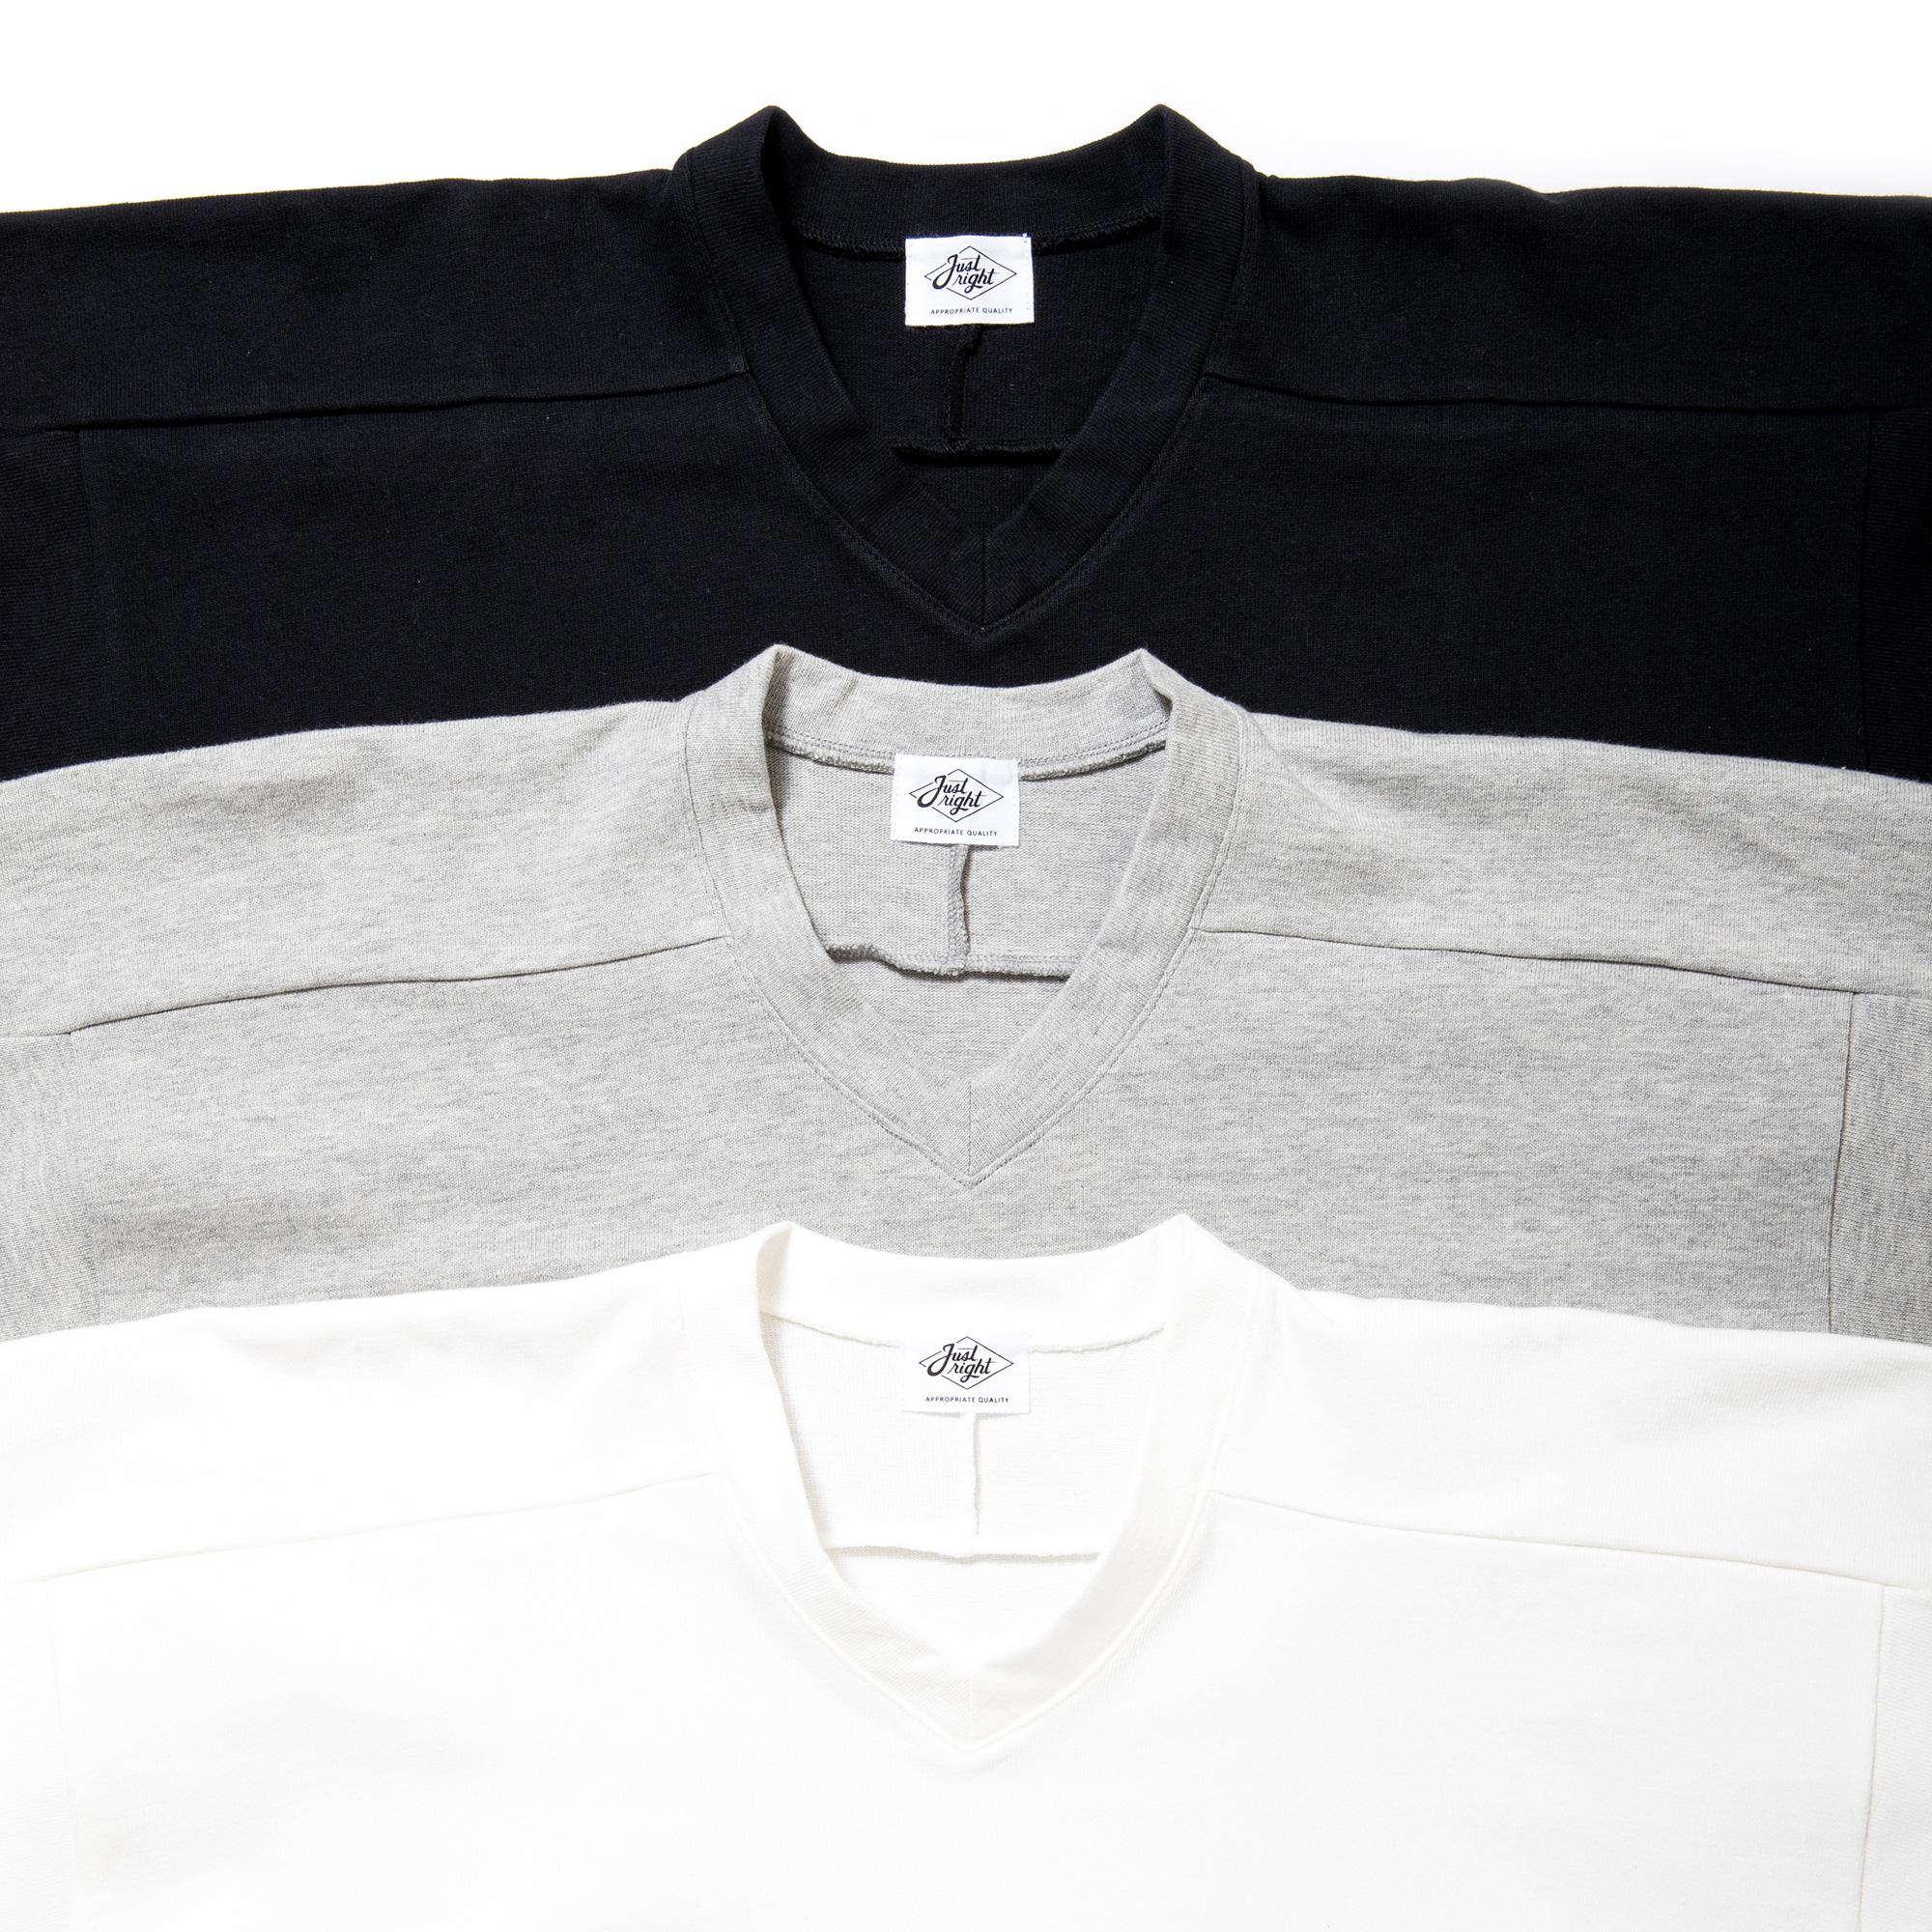 Hockey Shirt - Restock & New Color